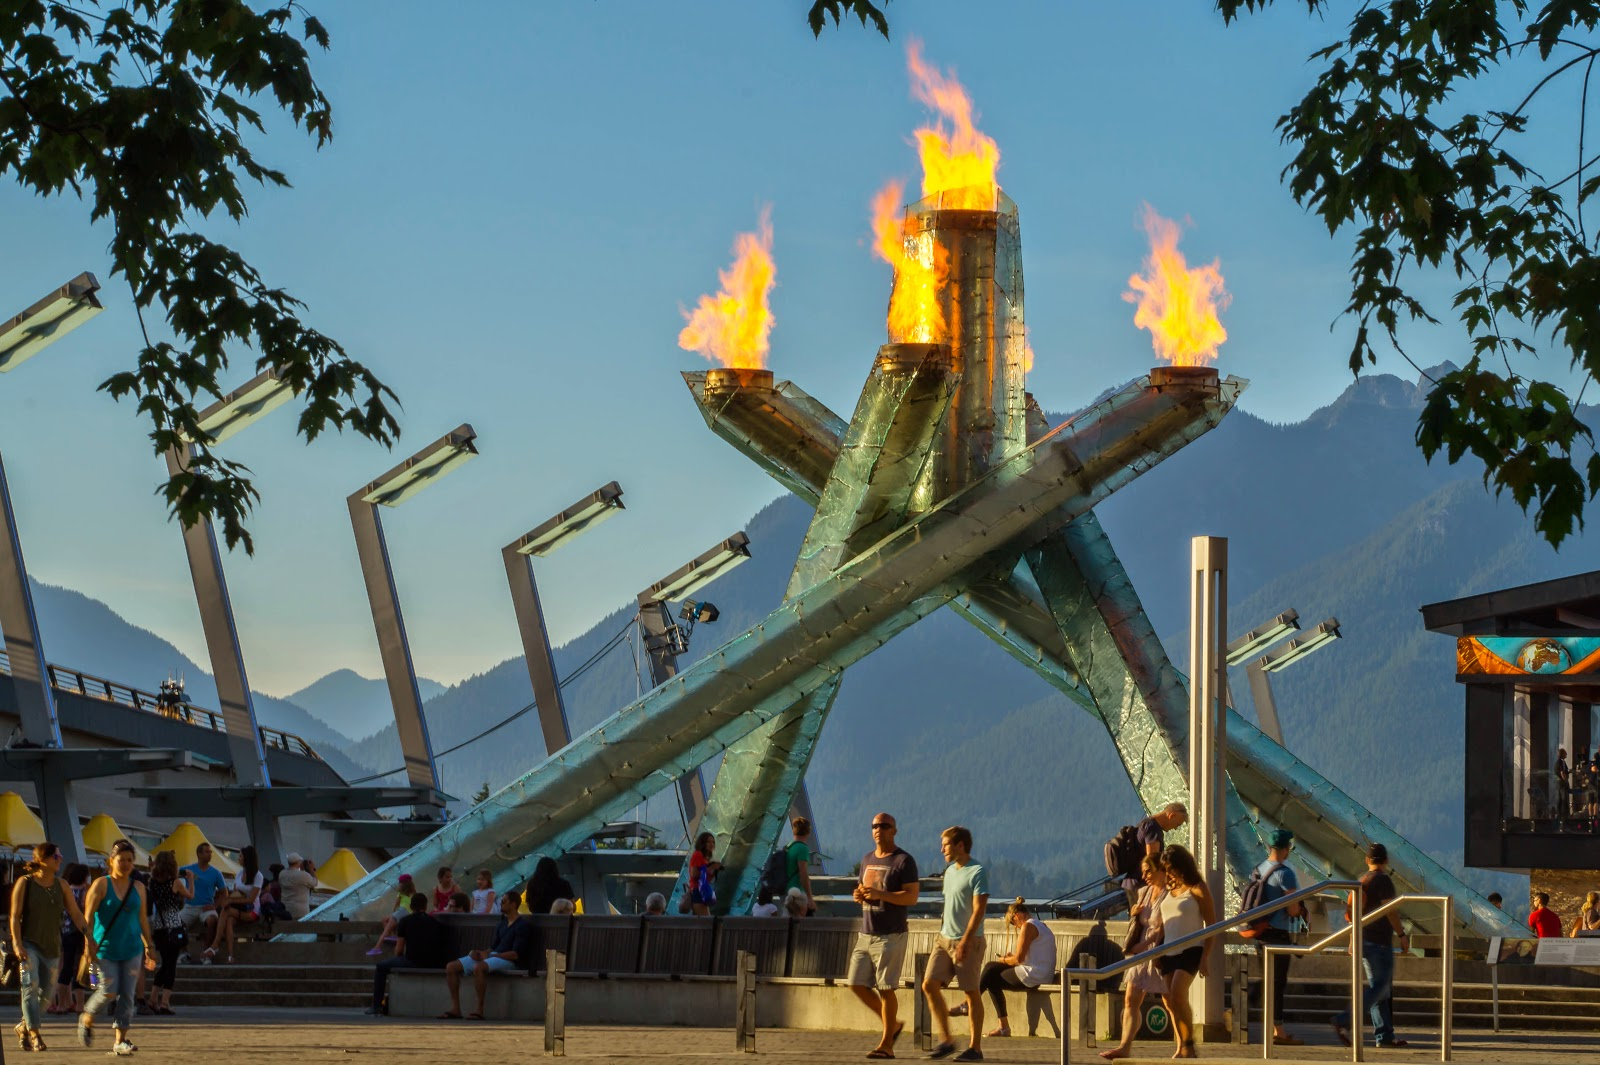 факел олимпийских игр 2010 года